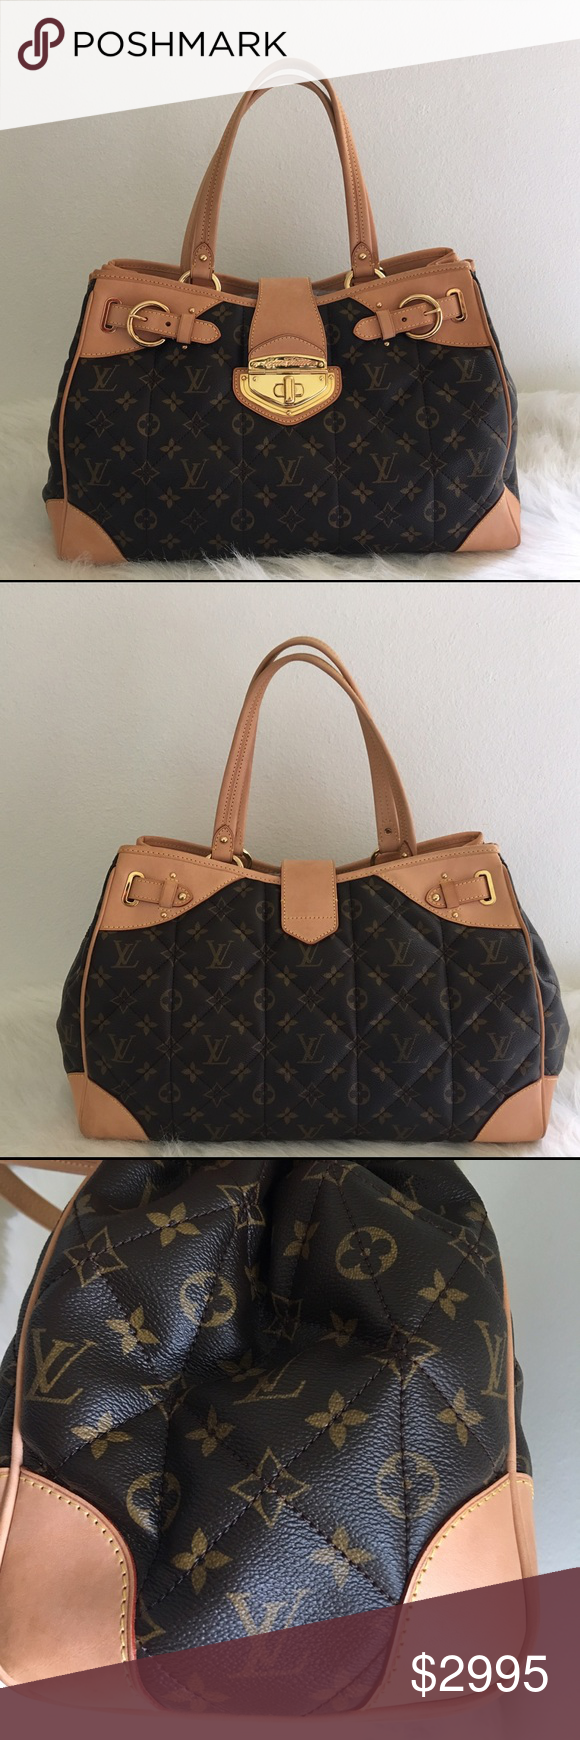 4000 AUTHENTIC LOUIS VUITTON ETOILE SD3058 Beautiful authentic Louis  Vuitton handbag unlike everyone else s. It fe67e0e1b853e